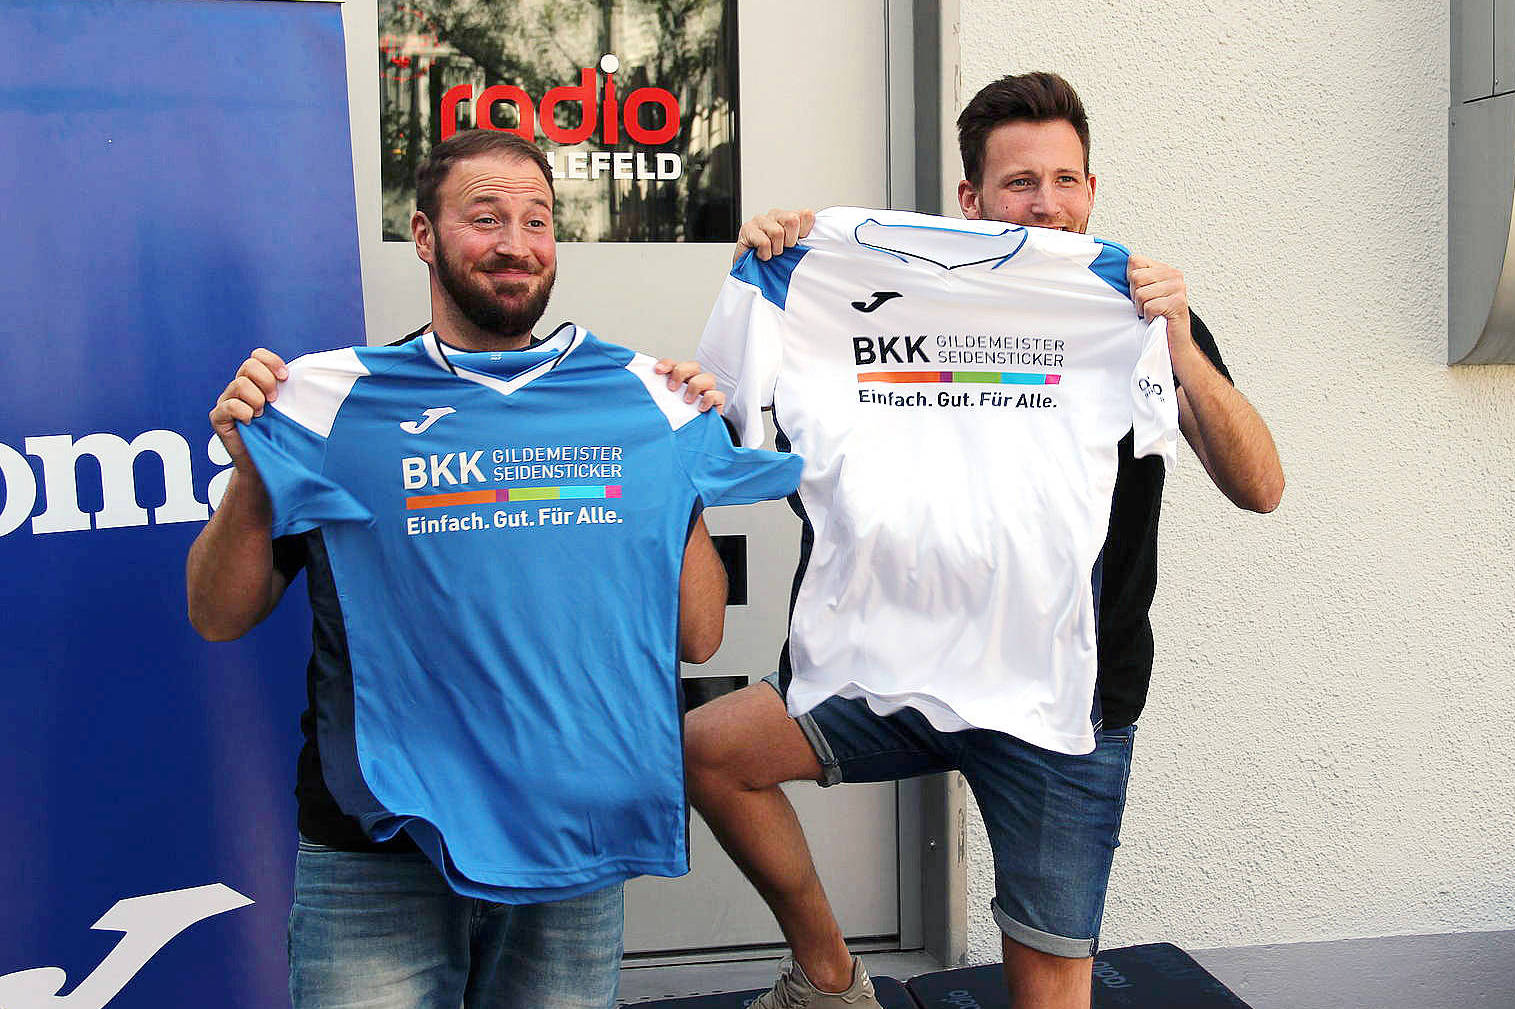 Radio Bielefeld Vereinkleiden 2019